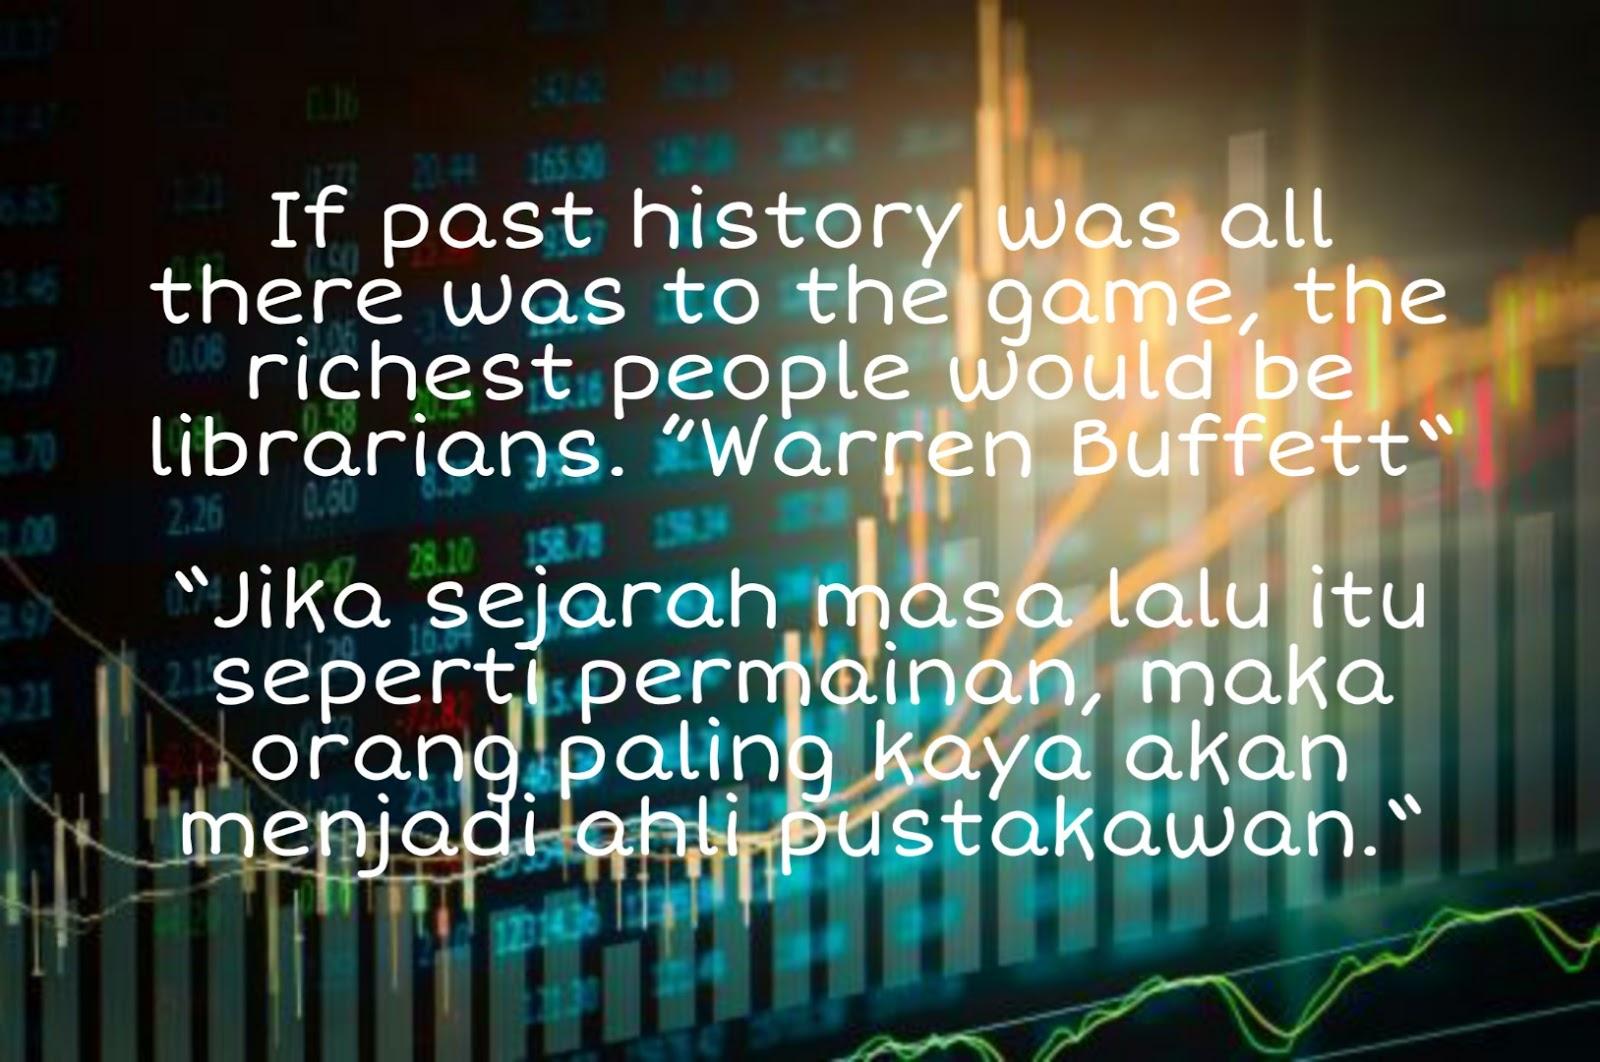 20 Kata Bijak Mengenai Hari Pasar Modal Indonesia Dalam Bahasa Inggris Beserta Artinya